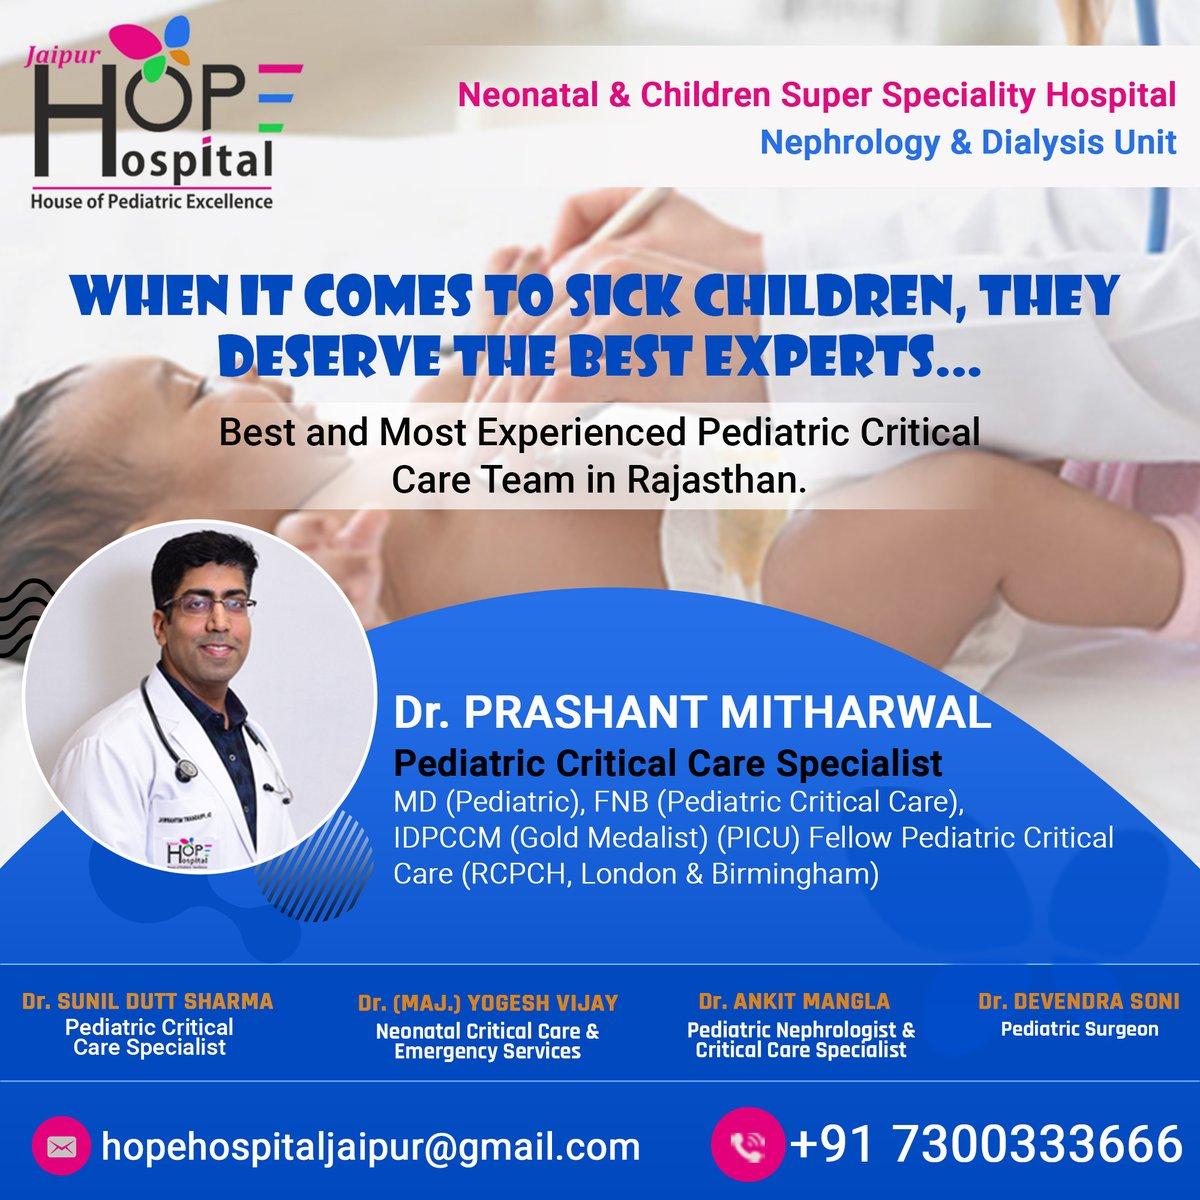 When it Comes to Sick Children👶, They Deserve the Best Experts☺️...  𝗖𝗼𝗻𝘁𝗮𝗰𝘁 & 𝗩𝗶𝘀𝗶𝘁 𝗳𝗼𝗿 𝗺𝗼𝗿𝗲 𝗱𝗲𝘁𝗮𝗶𝗹𝘀:👉  𝗣𝗵𝗼𝗻𝗲 𝗡𝗼. - 7300333666/7300333777  𝗪𝗲𝗯𝘀𝗶𝘁𝗲 - https://t.co/kWz8hFUjAj  #hopehospital #neonatology #pediatric #newborn #neonatal #child https://t.co/xWxpp78hn8